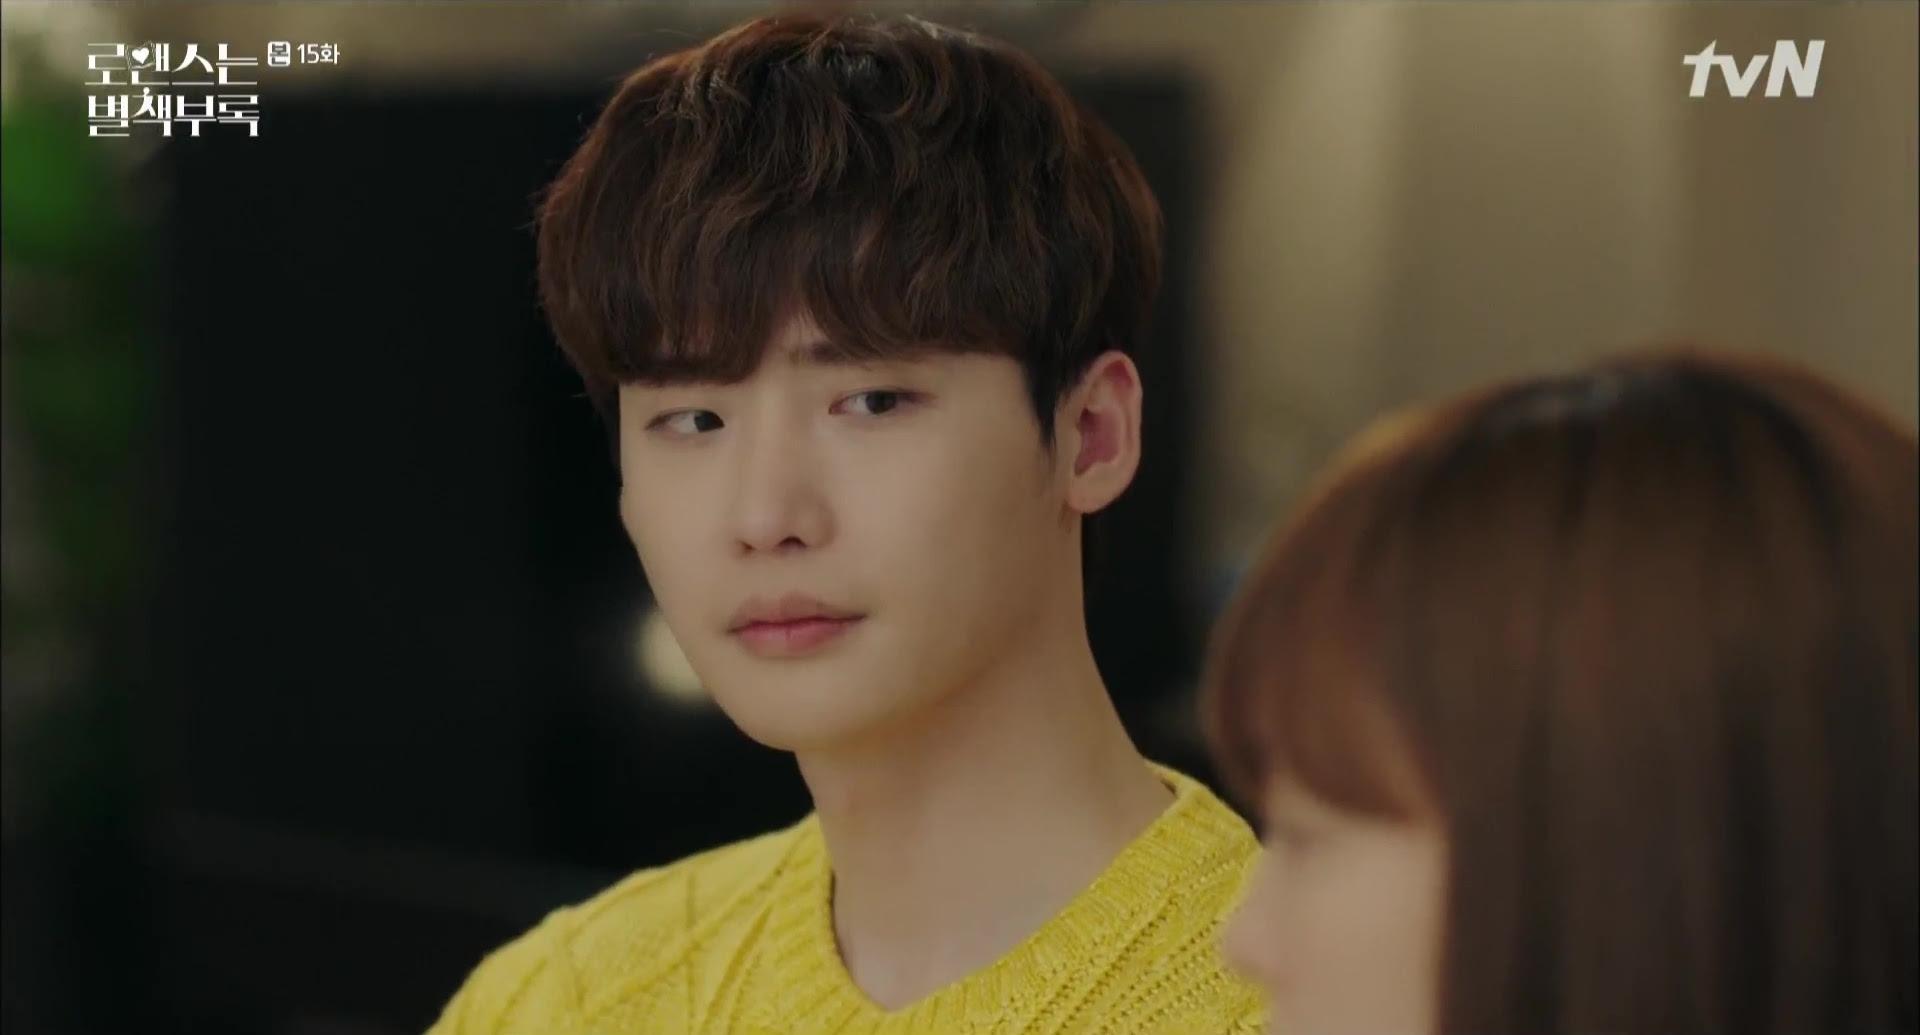 Dan yi berpikir Seo joon adalah putra yang disebutkan oleh Penulis Kang Ha rin menunjukkan bahwa Penulis Kang selalu hidup sendirian dan menyadari Eun ho